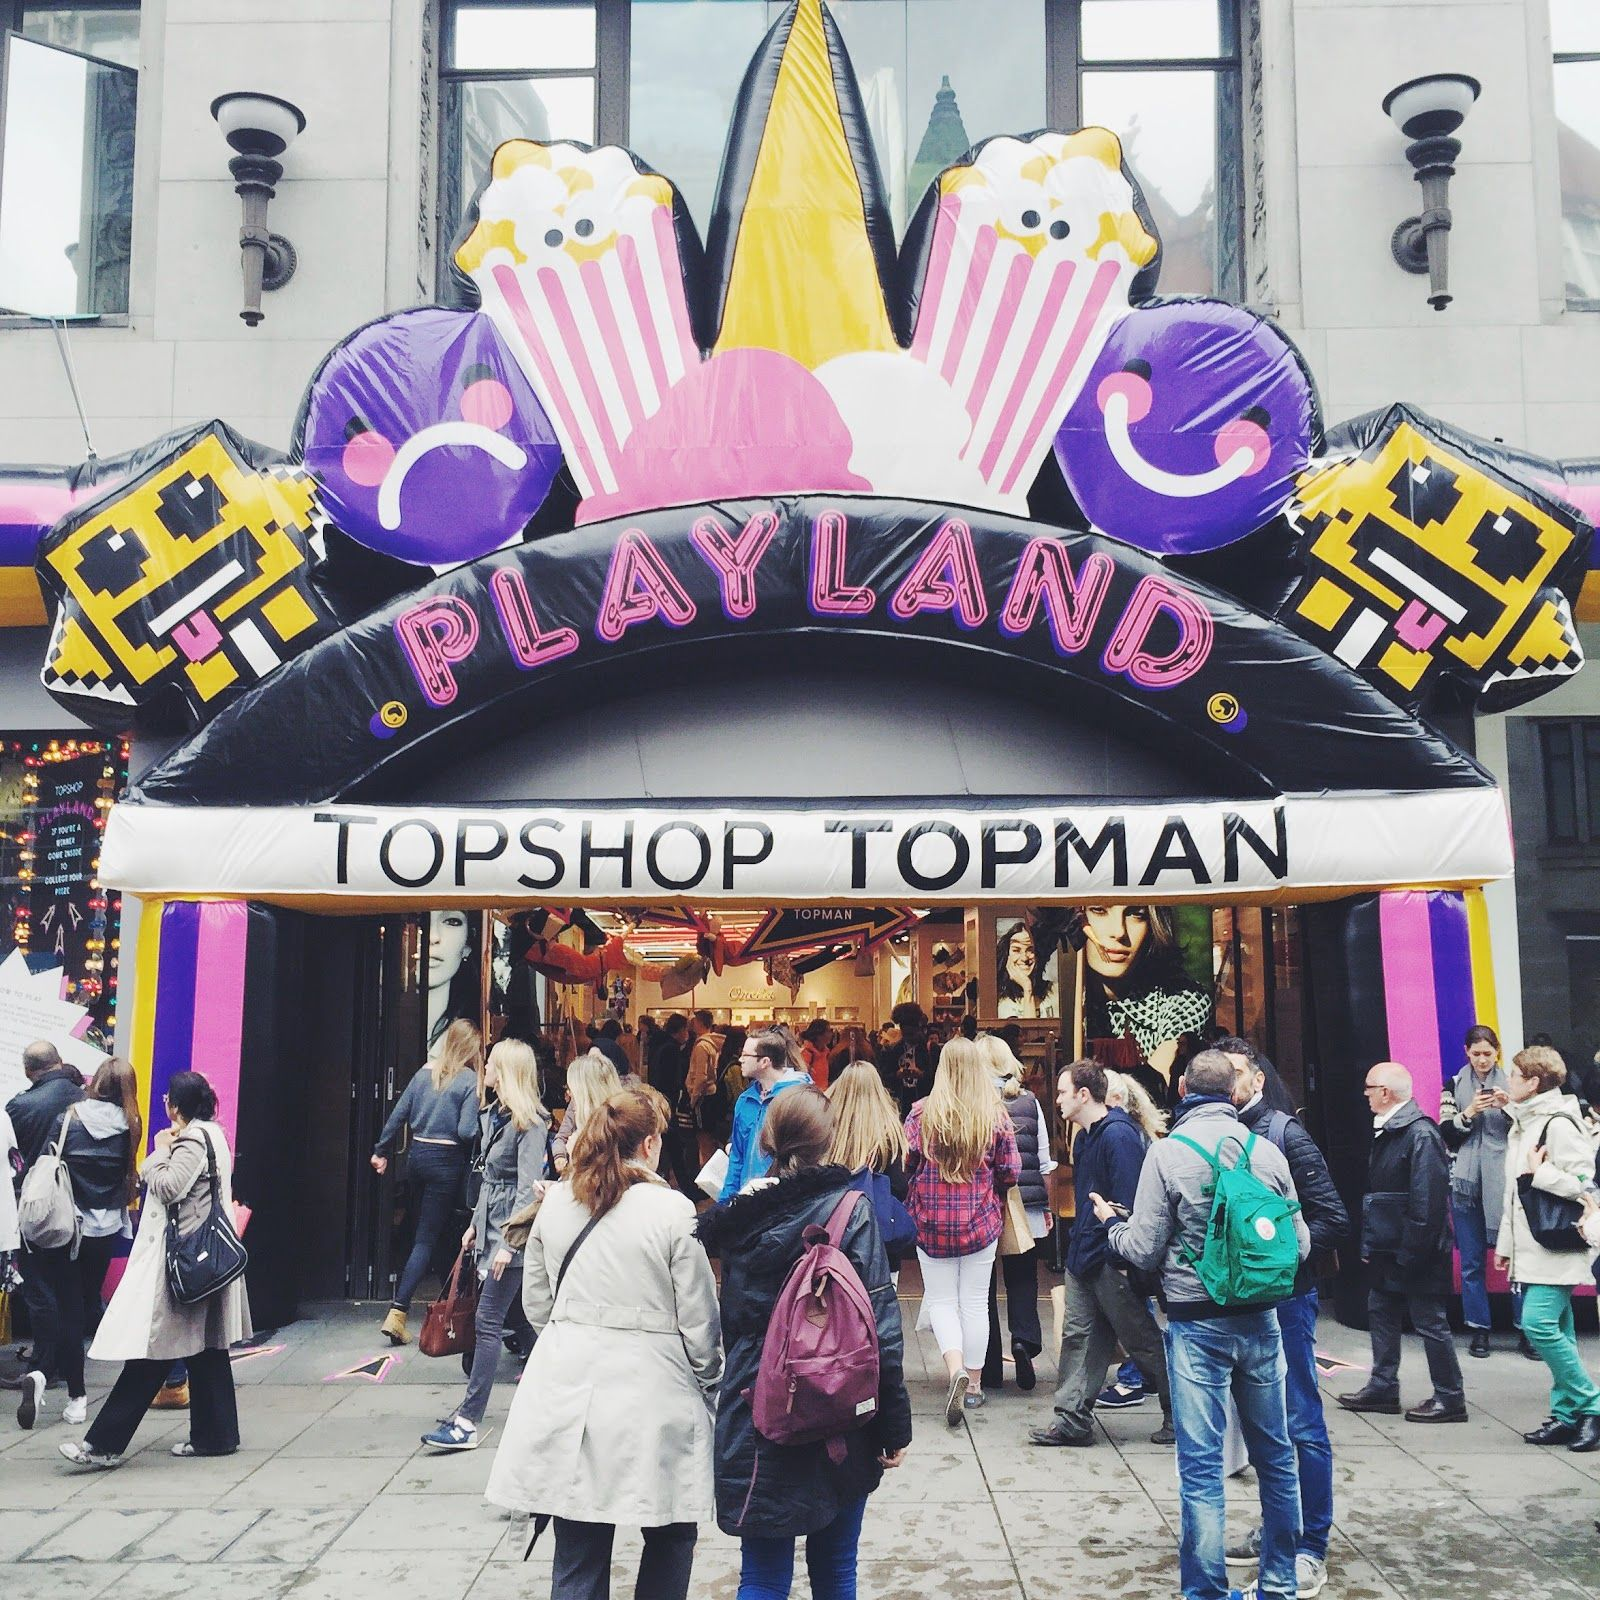 Topshop Oxford Circus, Topshop Playland